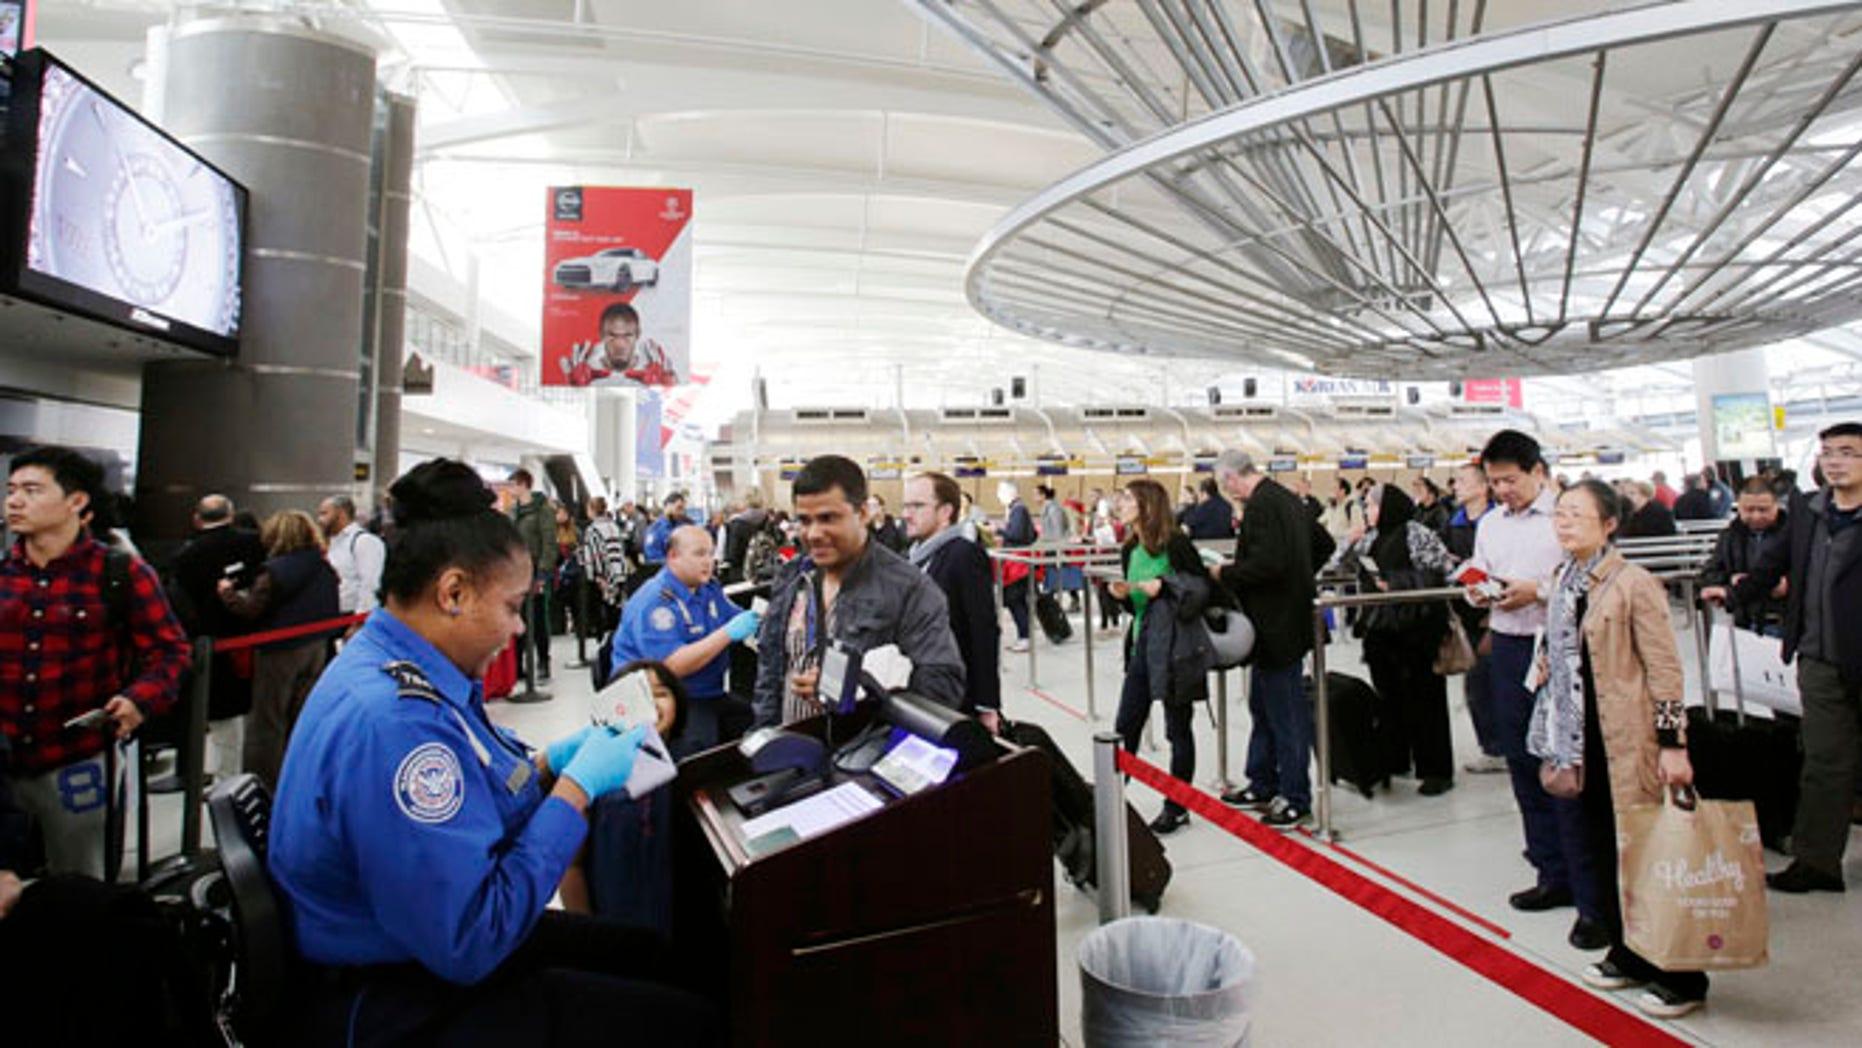 Oct. 30, 2014: A TSA officer, left, checks a passenger's ticket, boarding pass and passport as part of security screening at John F. Kennedy International Airport in New York. (AP)